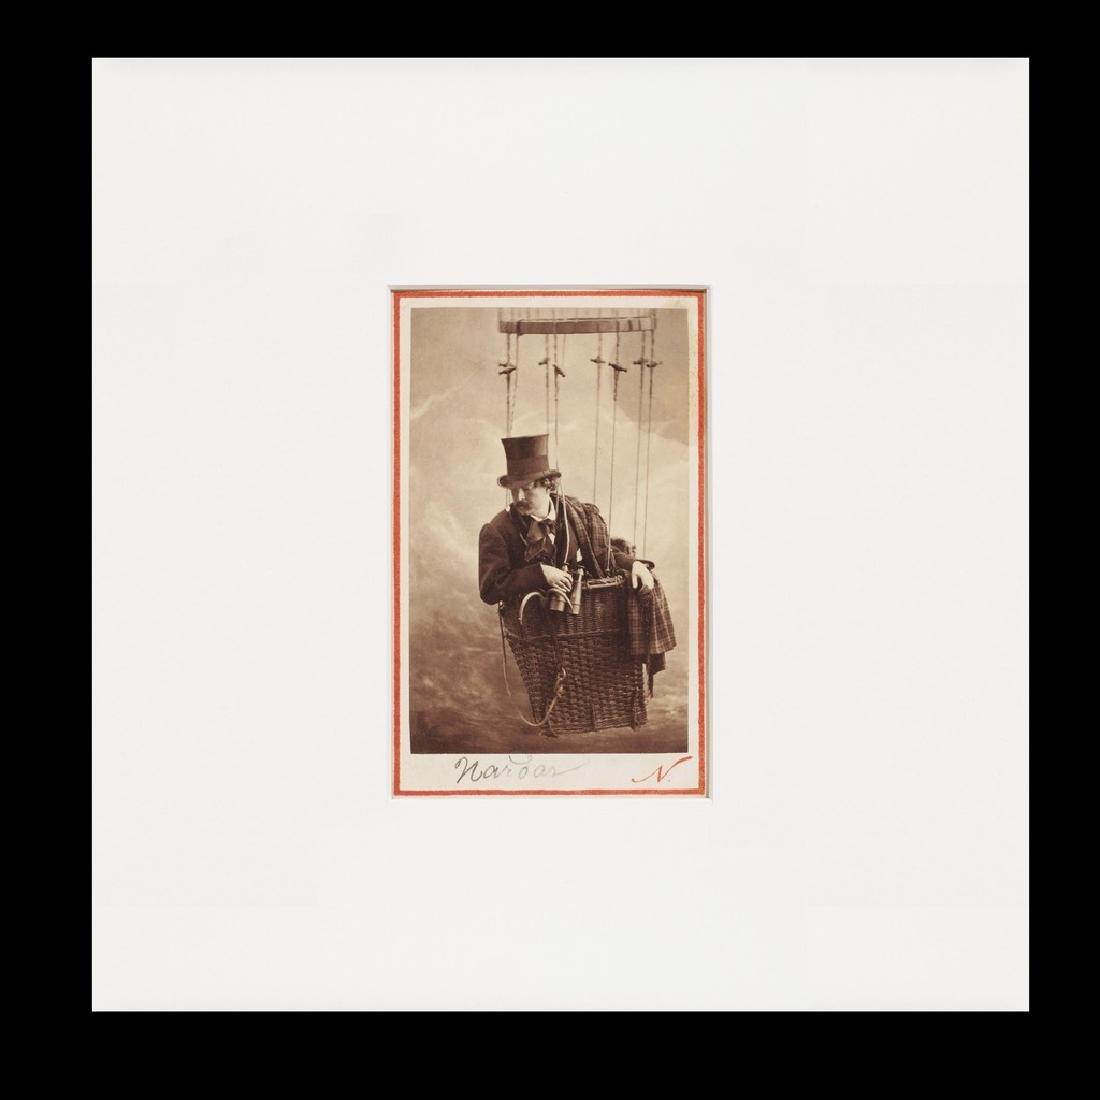 Nadar (French, 1820 - 1910) [Gaspard Félix Tournachon] - 8